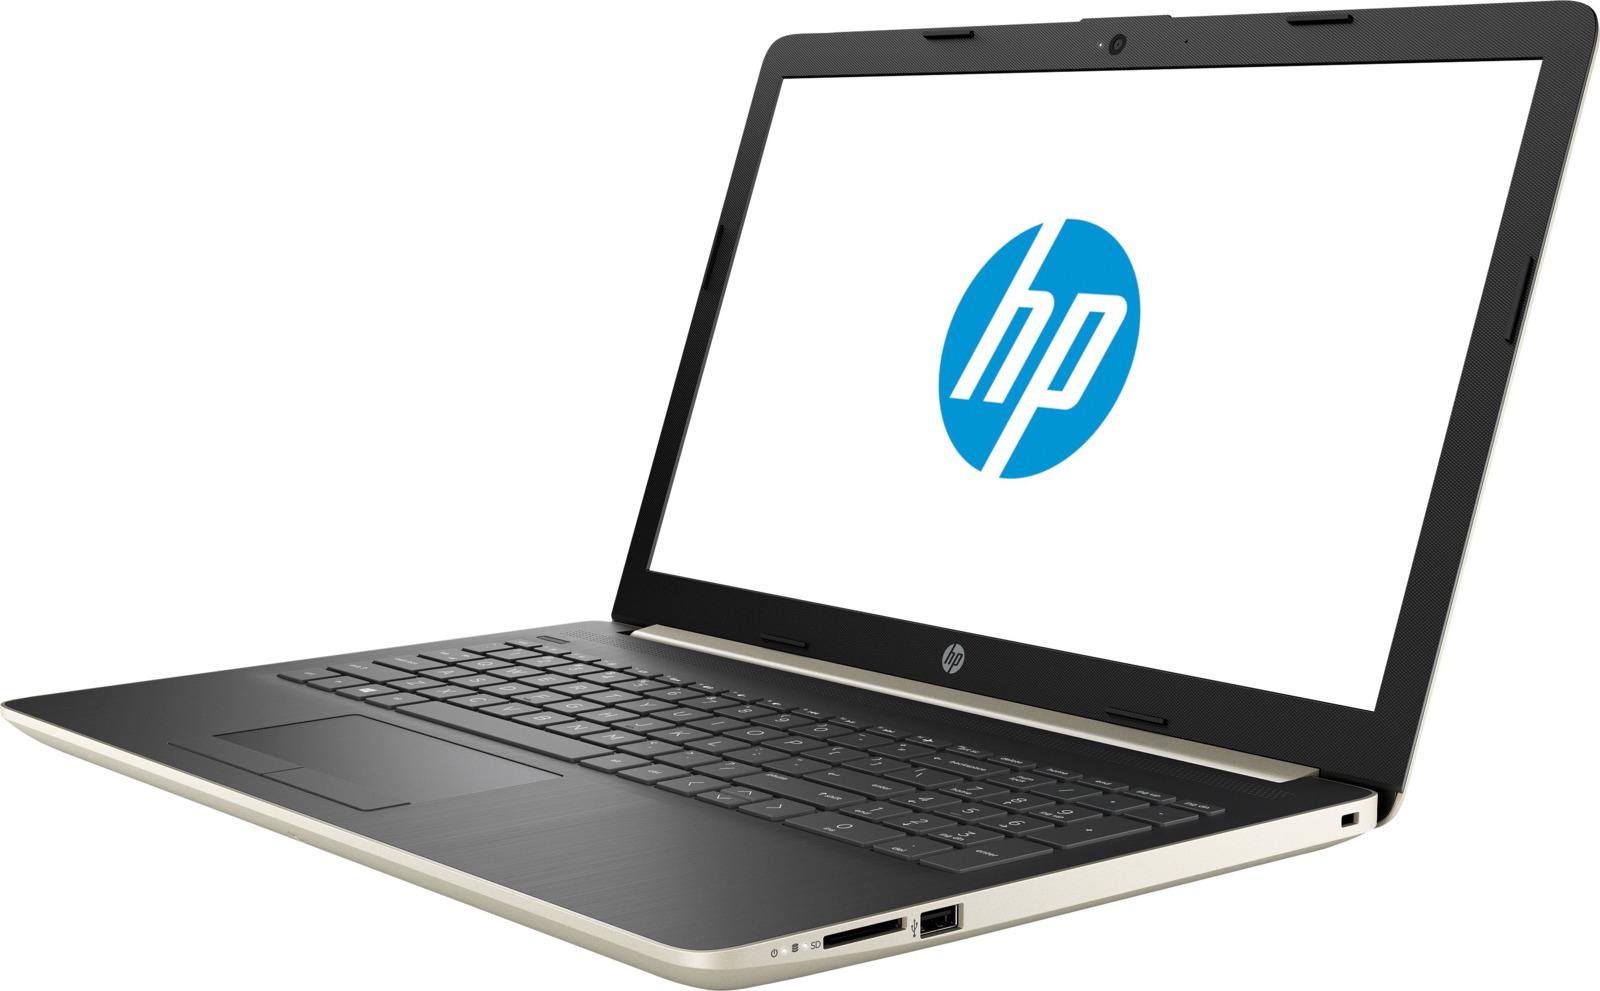 15.6 Ноутбук HP 15-db0090ur 4KA41EA, золотой 15 6 ноутбук hp 15 db0067ur 4jv07ea бордовый